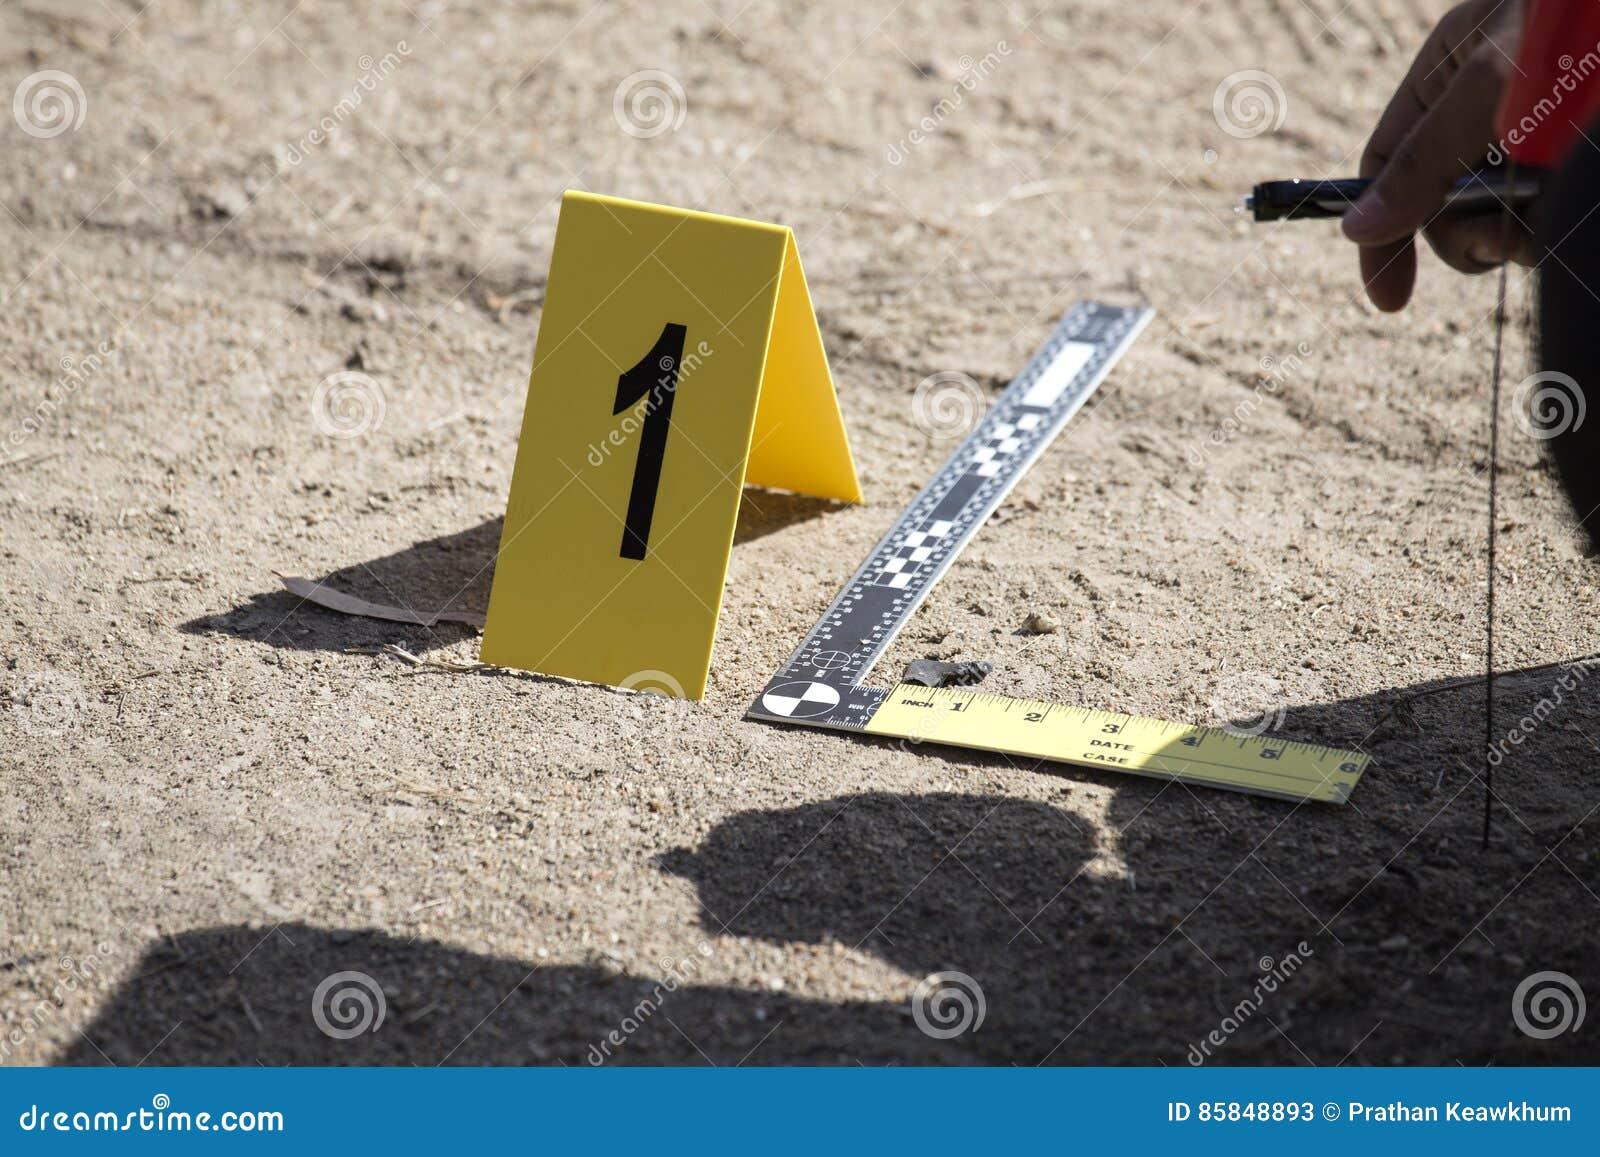 Marcador da evidência e escala da régua da evidência com enforcemen da lei